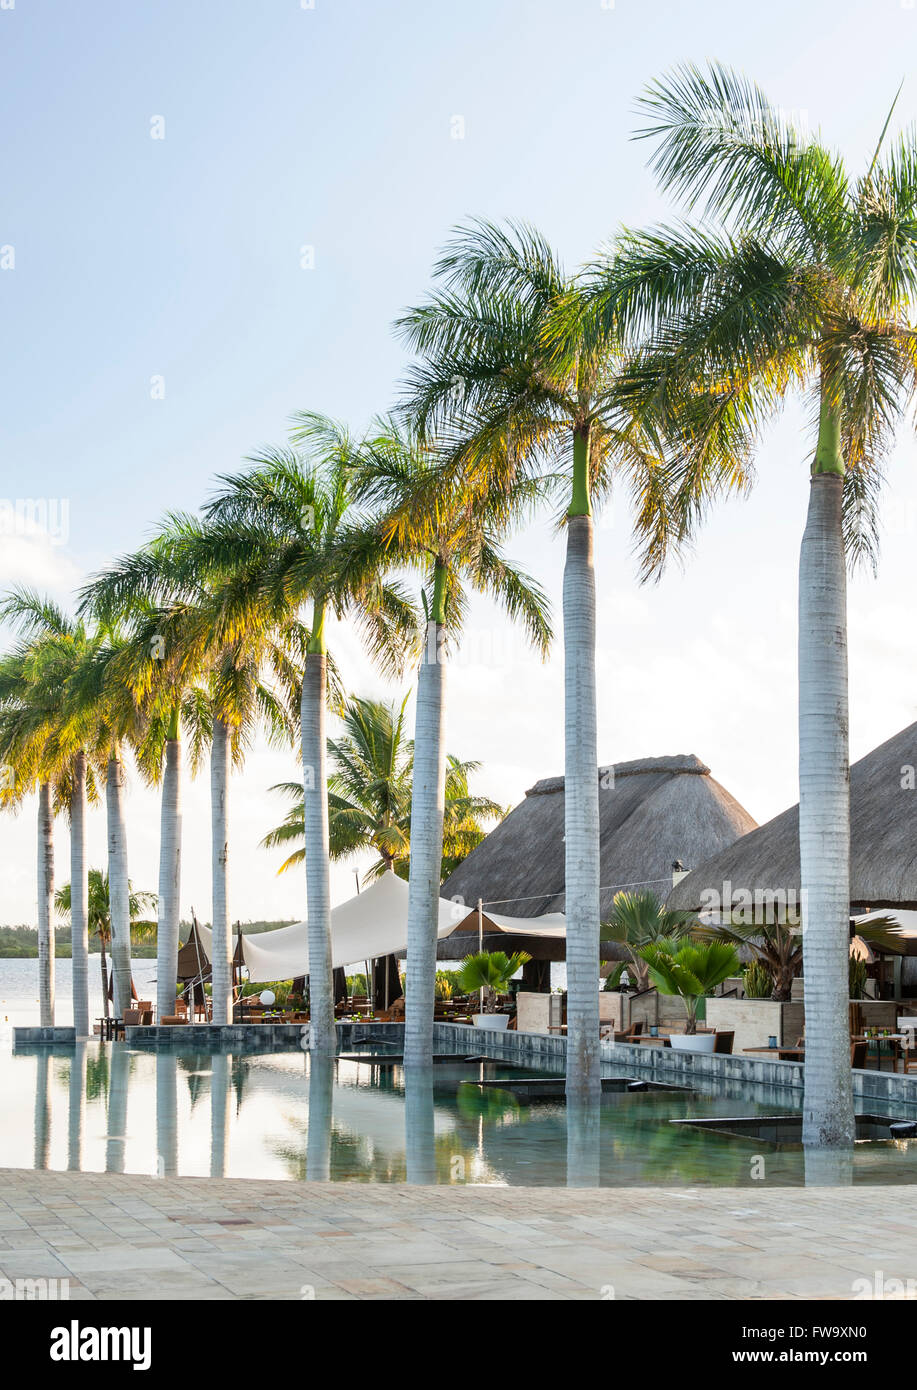 Four Seasons Hotel in Mauritius. Stock Photo